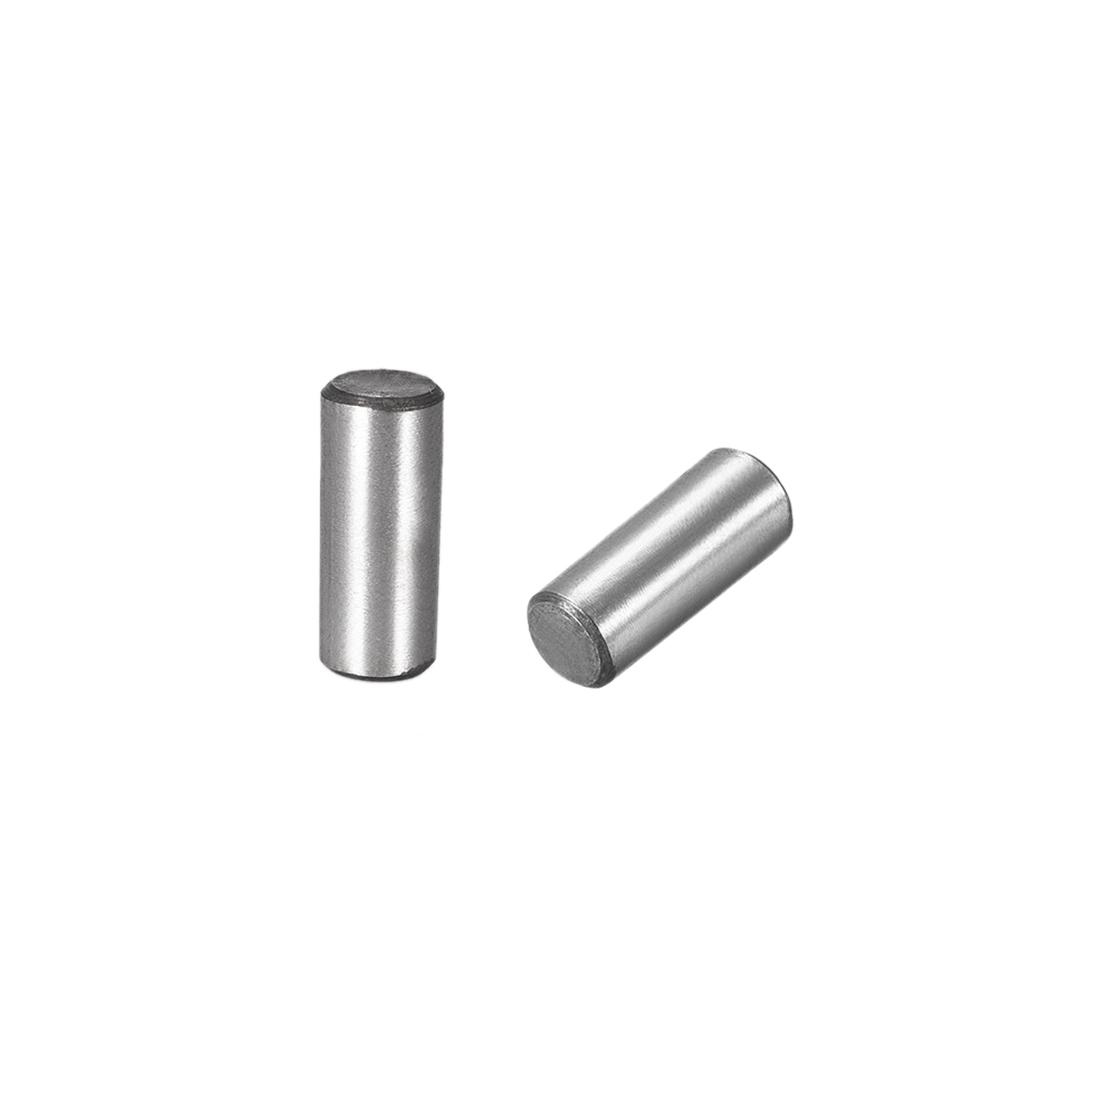 Carbon Steel GB117 20mm Length 8mmx8.4mm Small End Diameter 1:50 Taper Pin 10Pcs